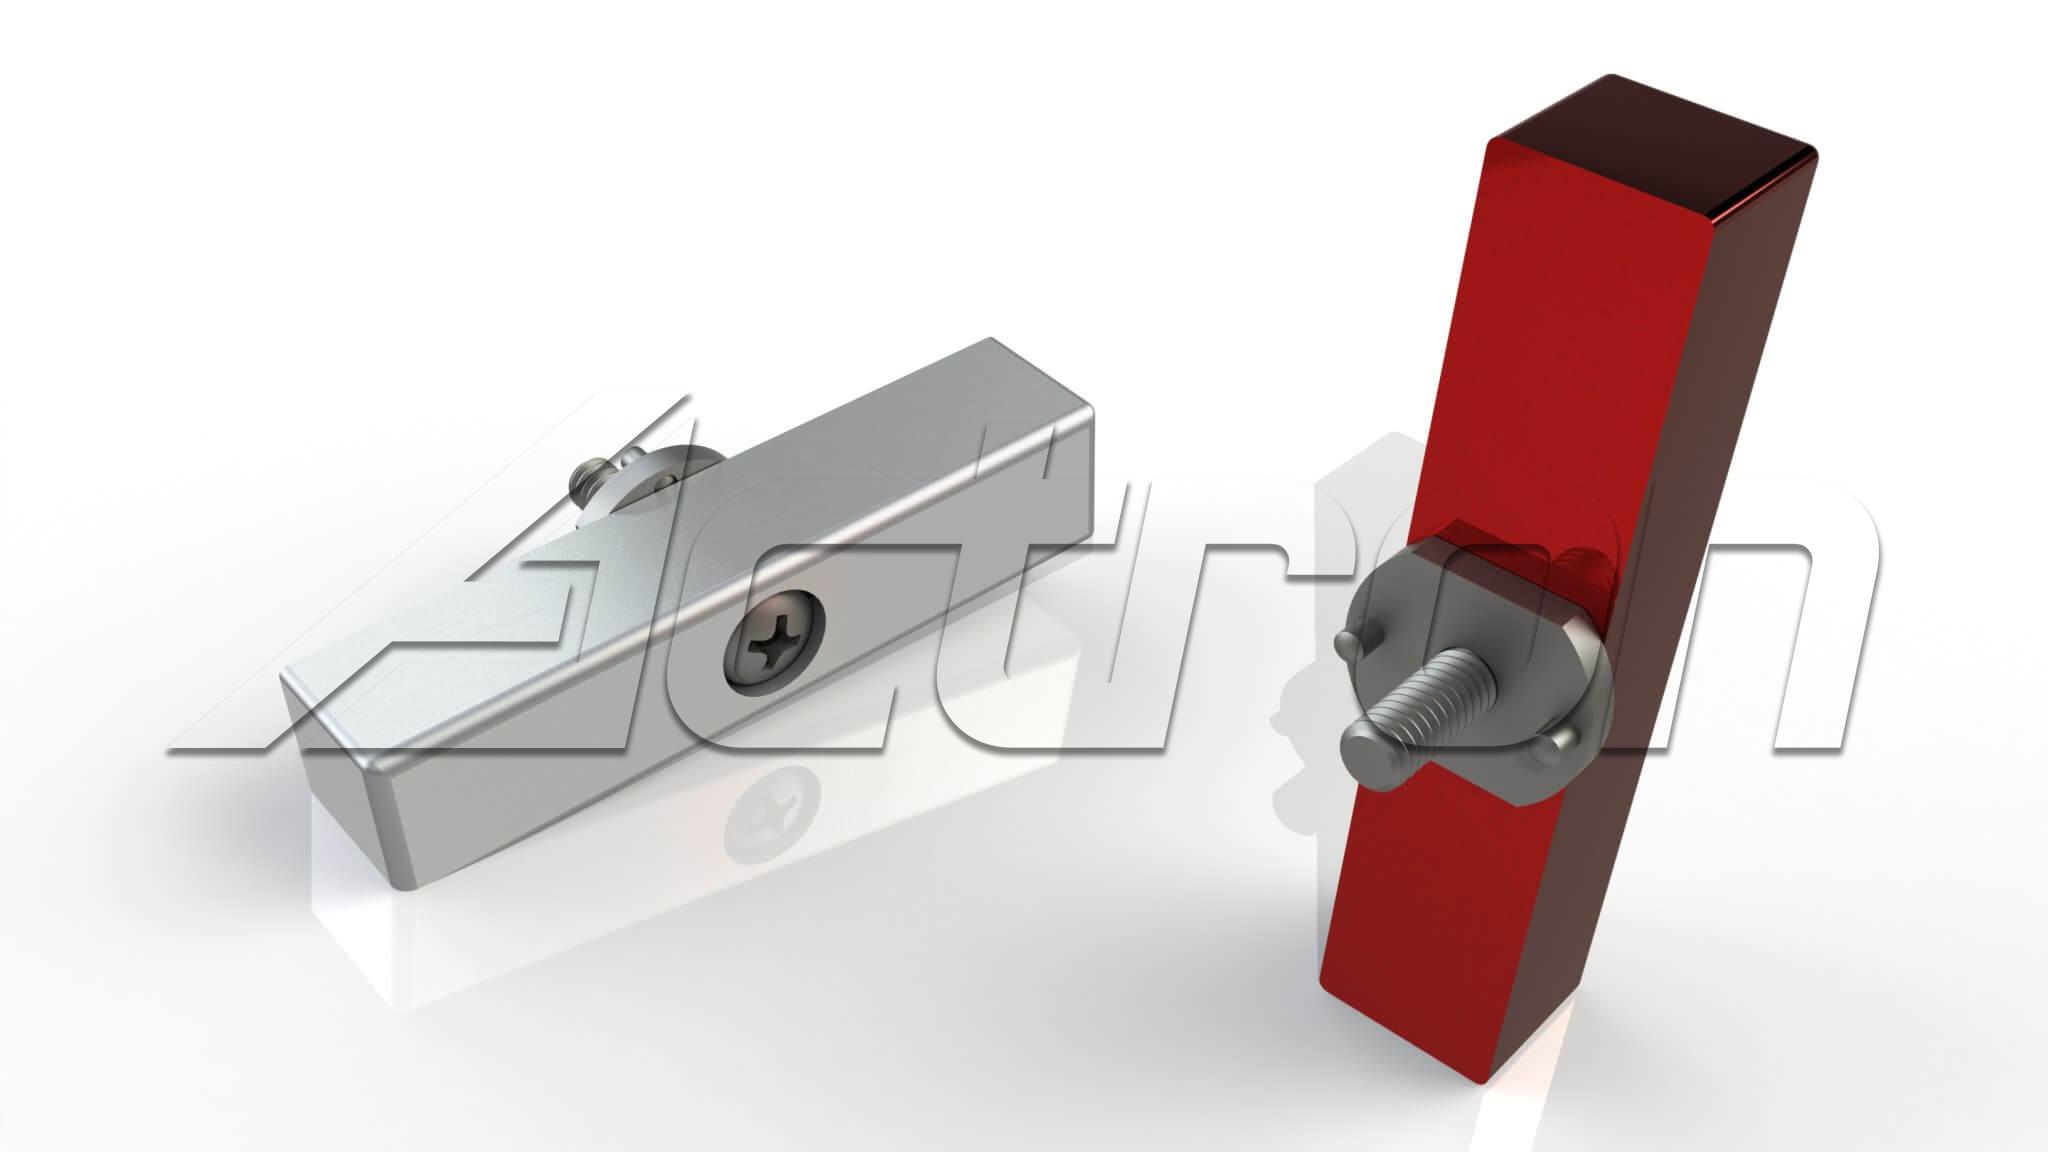 1-4-turn-retainer-4853-a35629.jpg